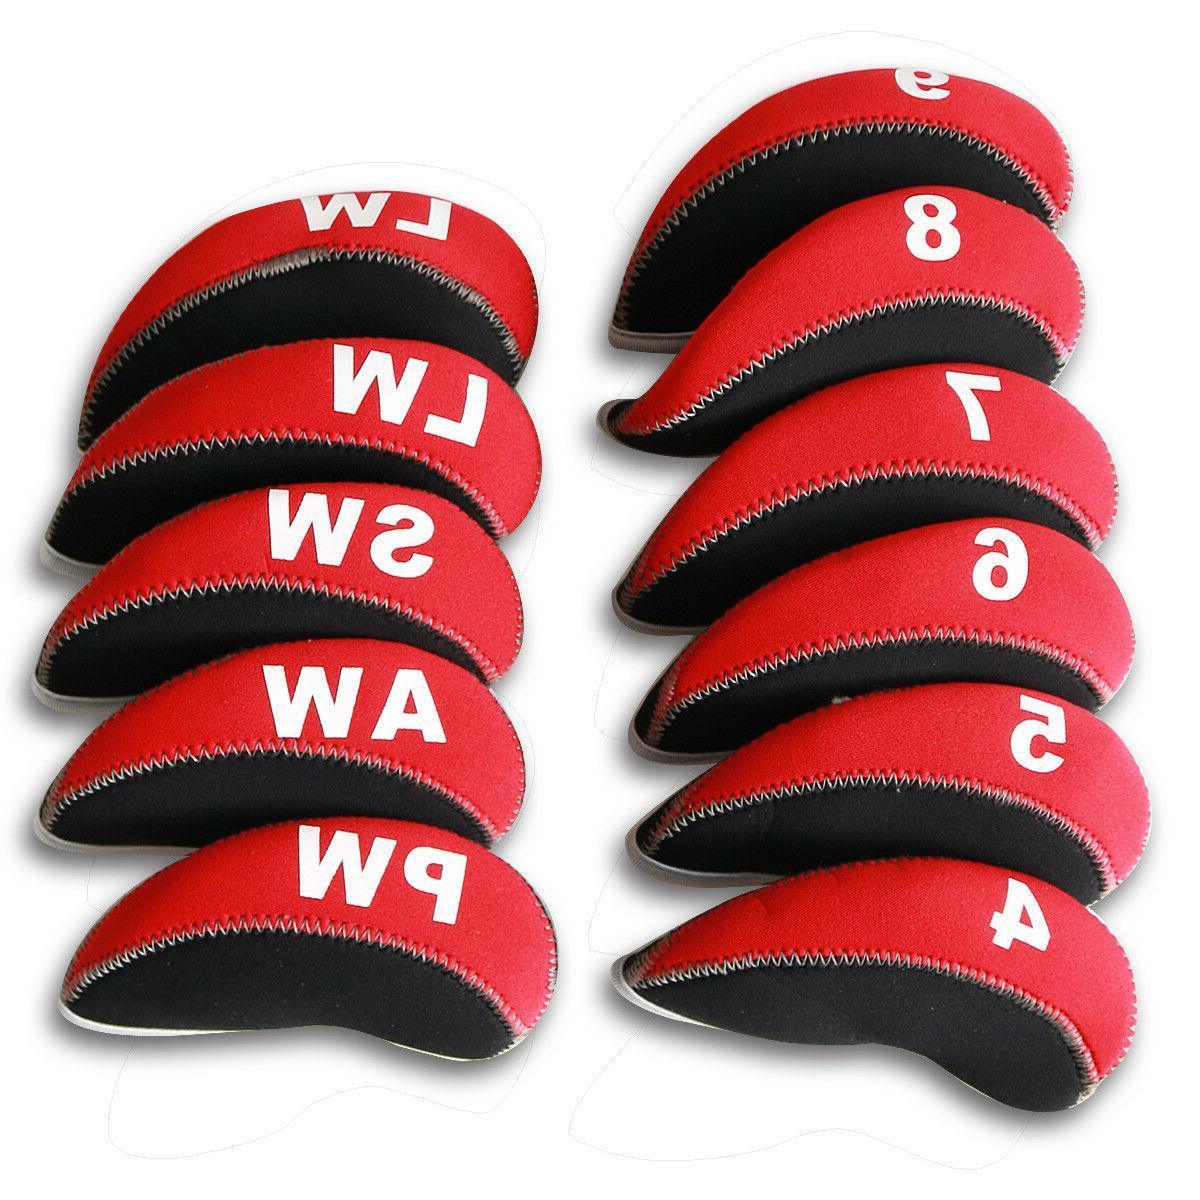 11pcs Iron Head Covers HeadCovers 4-LW Red&Black Cobra